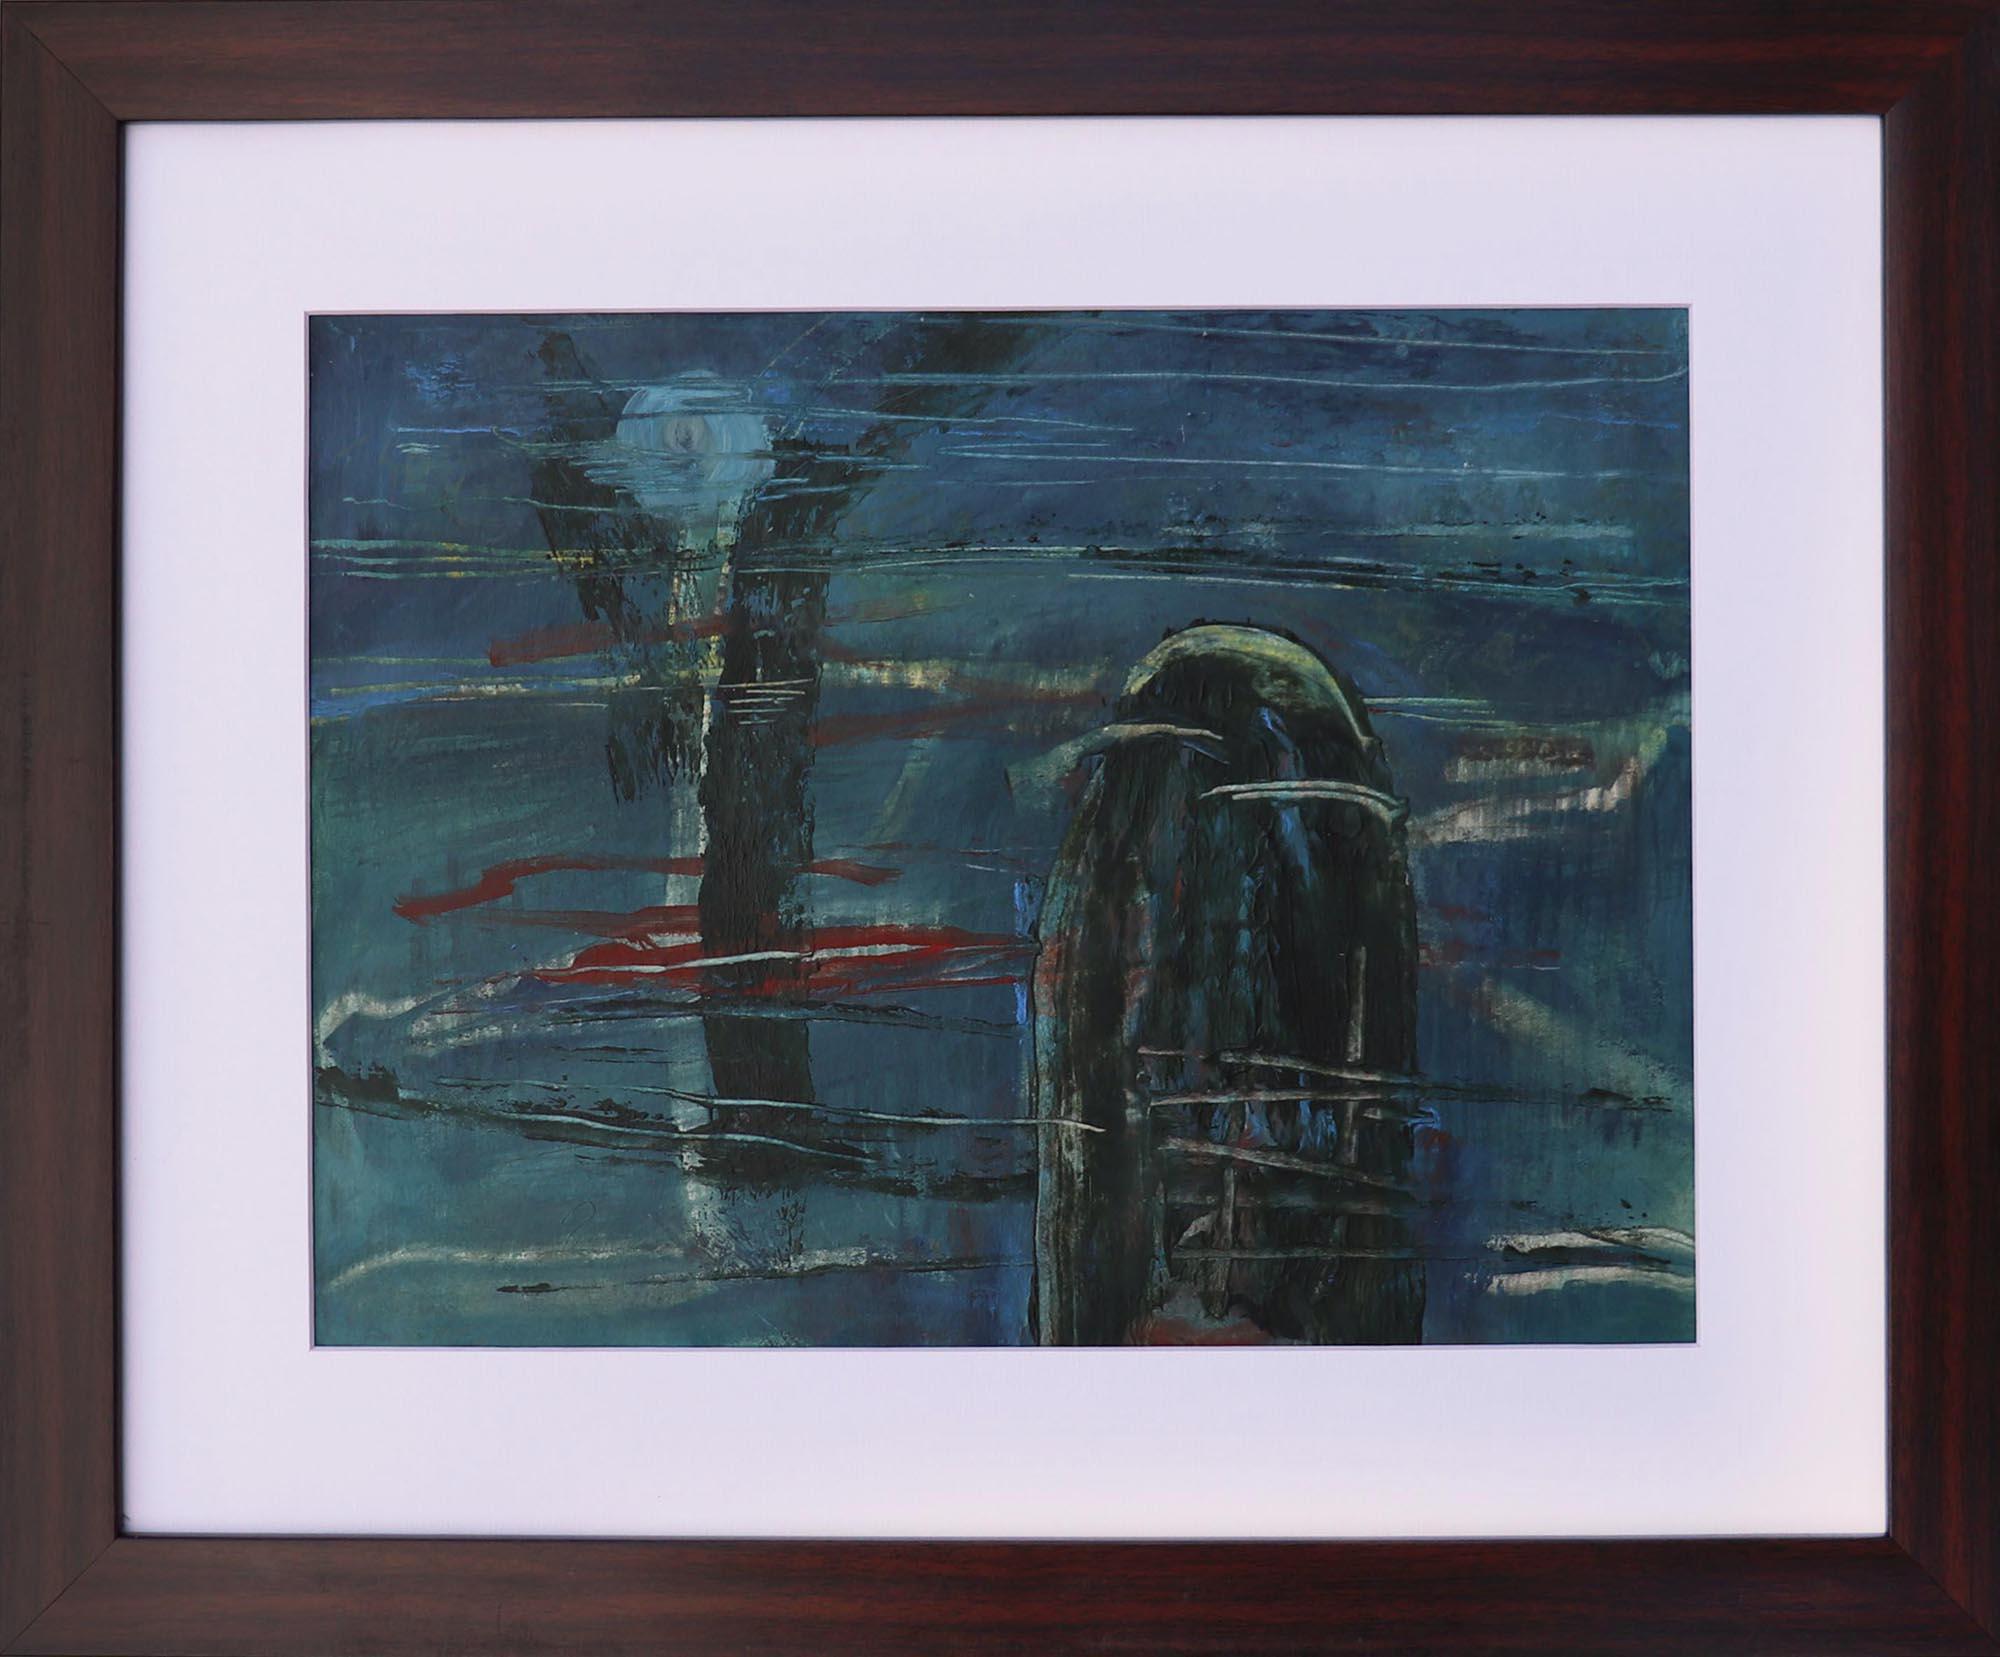 Moinuddin Moni, Blue monolith, Acrylic on paper, 42 x 50 cm with frame, 2017